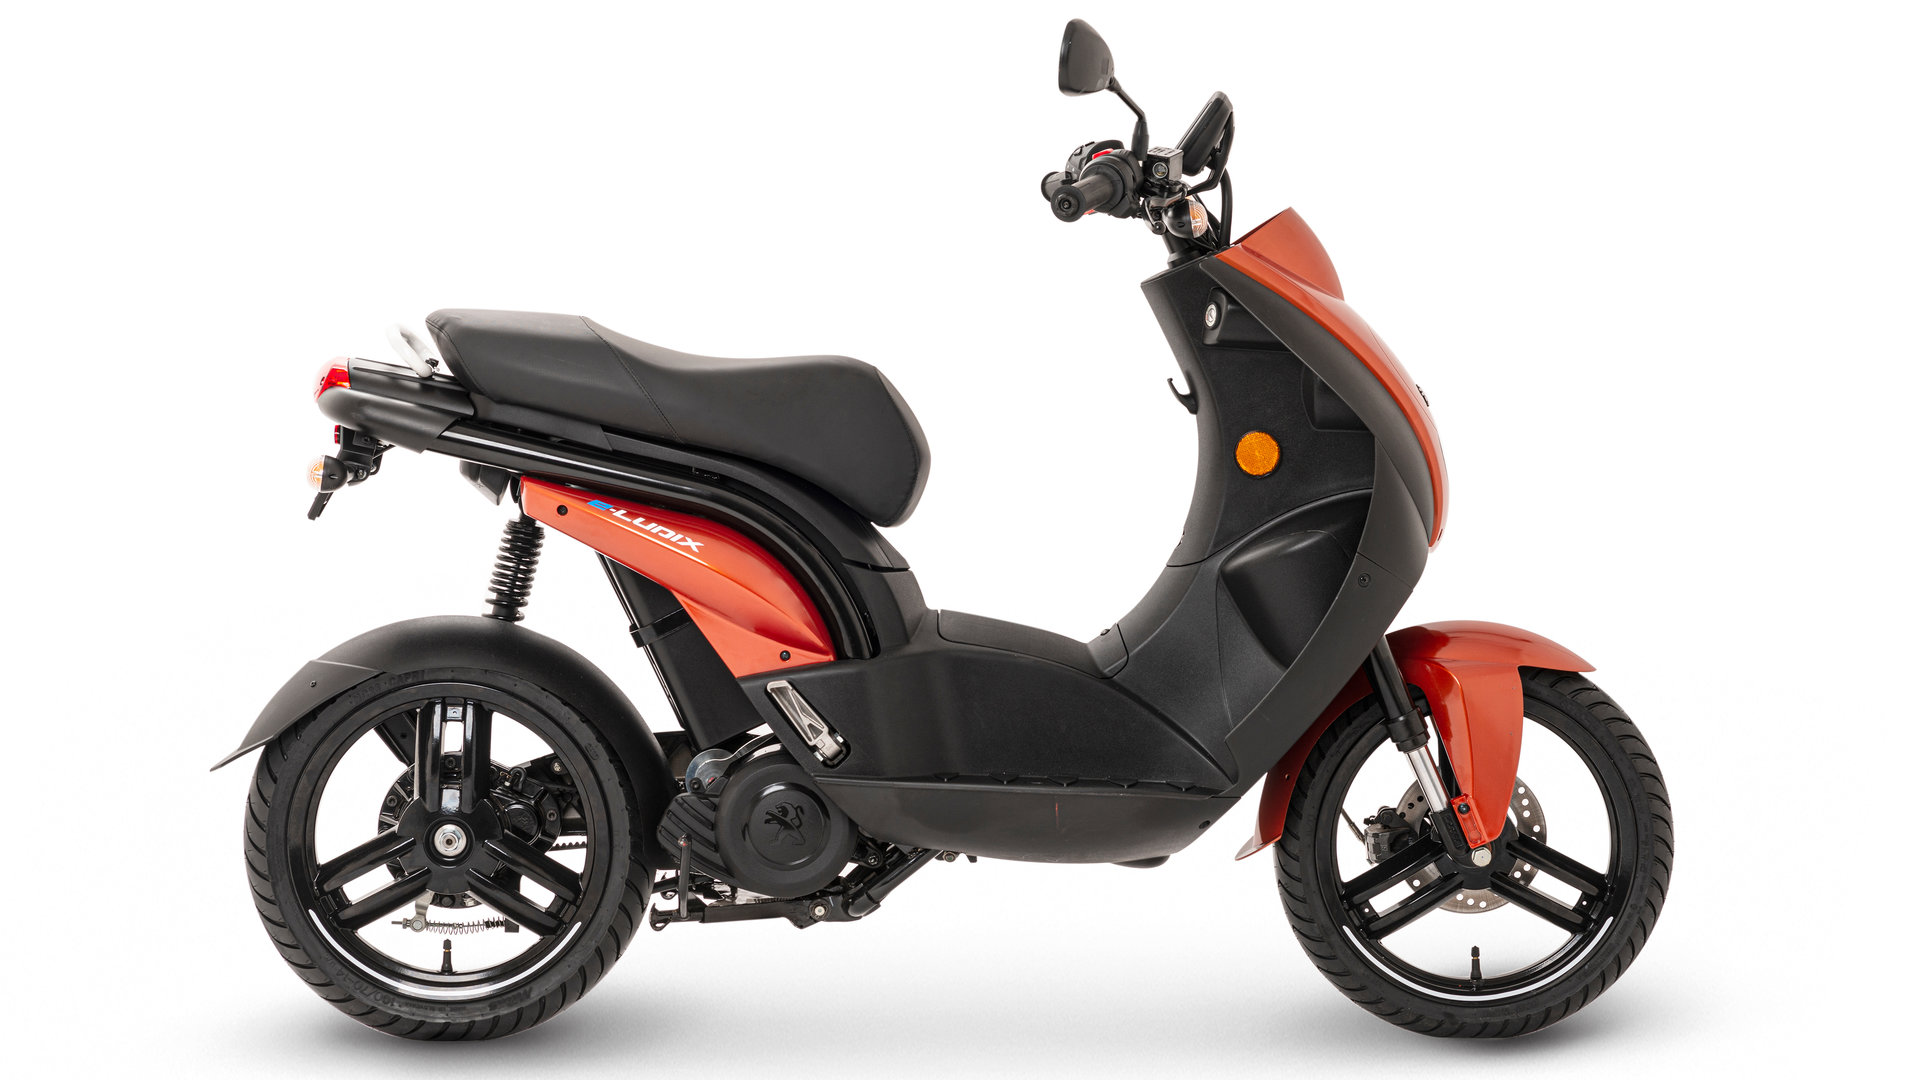 Peugeot e-Ludix, ¿una alternativa realista al típico ciclomotor gasolina?